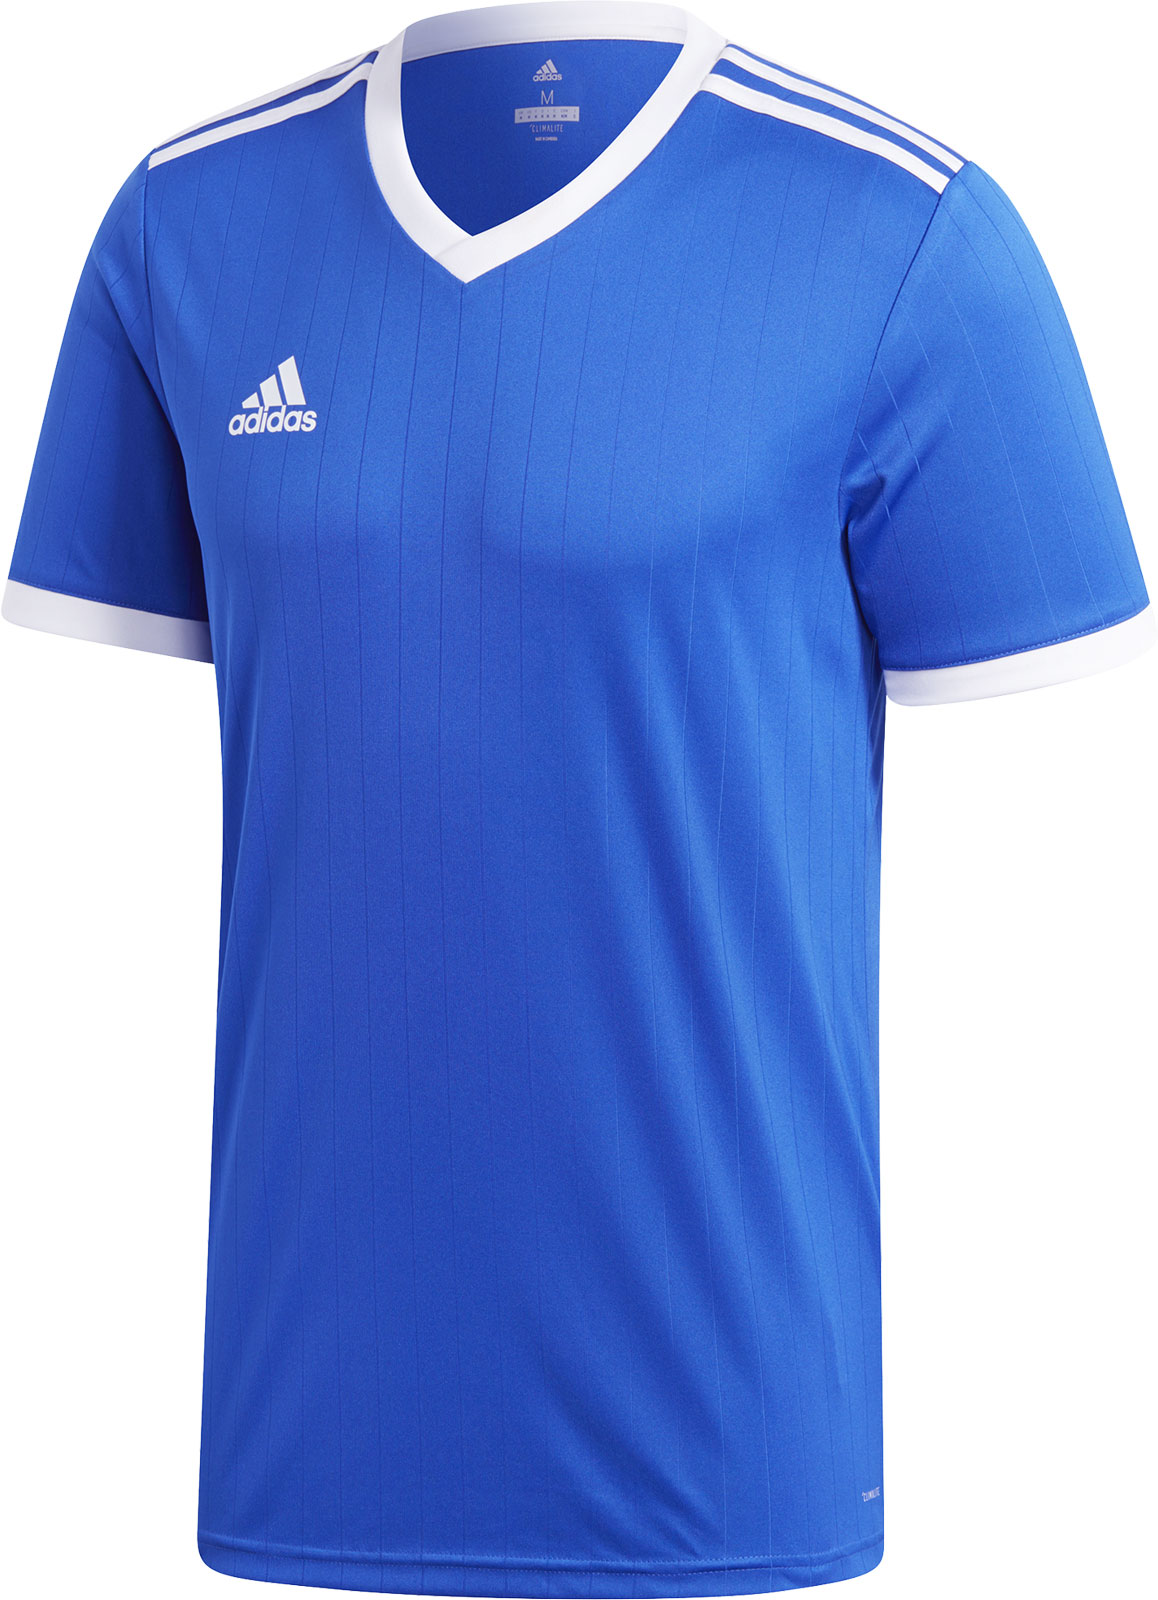 Футболка мужская Adidas Tabela 18 Jsy, цвет: голубой. CE8936. Размер XXL (60/62) футболка мужская adidas regista 18 jsy цвет синий белый ce8965 размер m 48 50